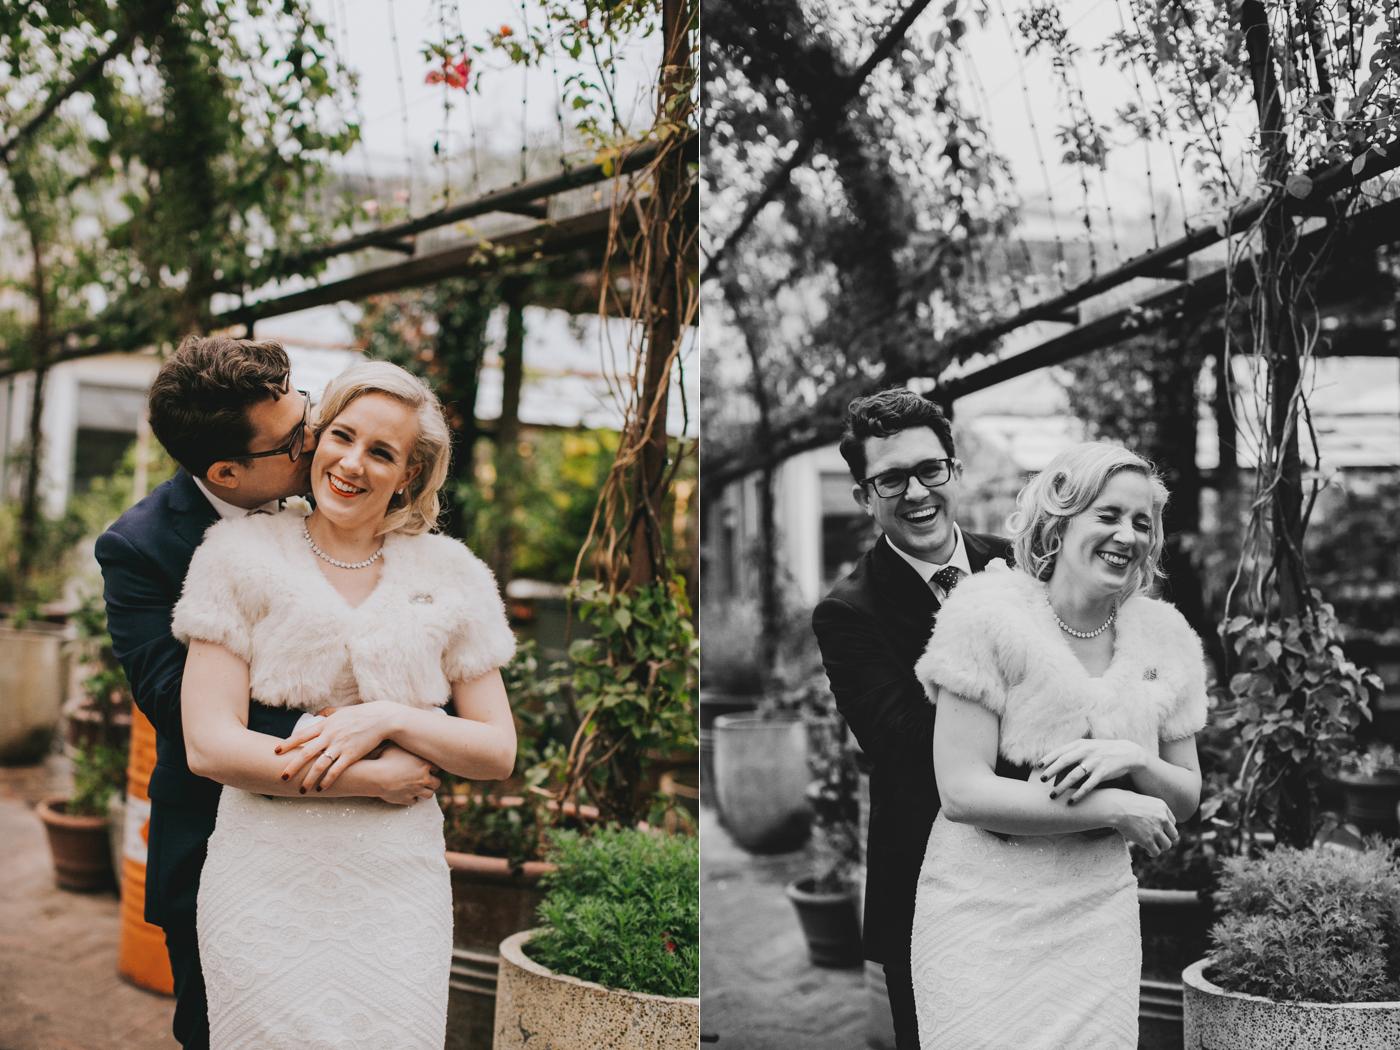 Jo & Tom Wedding - The Grounds of Alexandria - Samantha Heather Photography-232.jpg